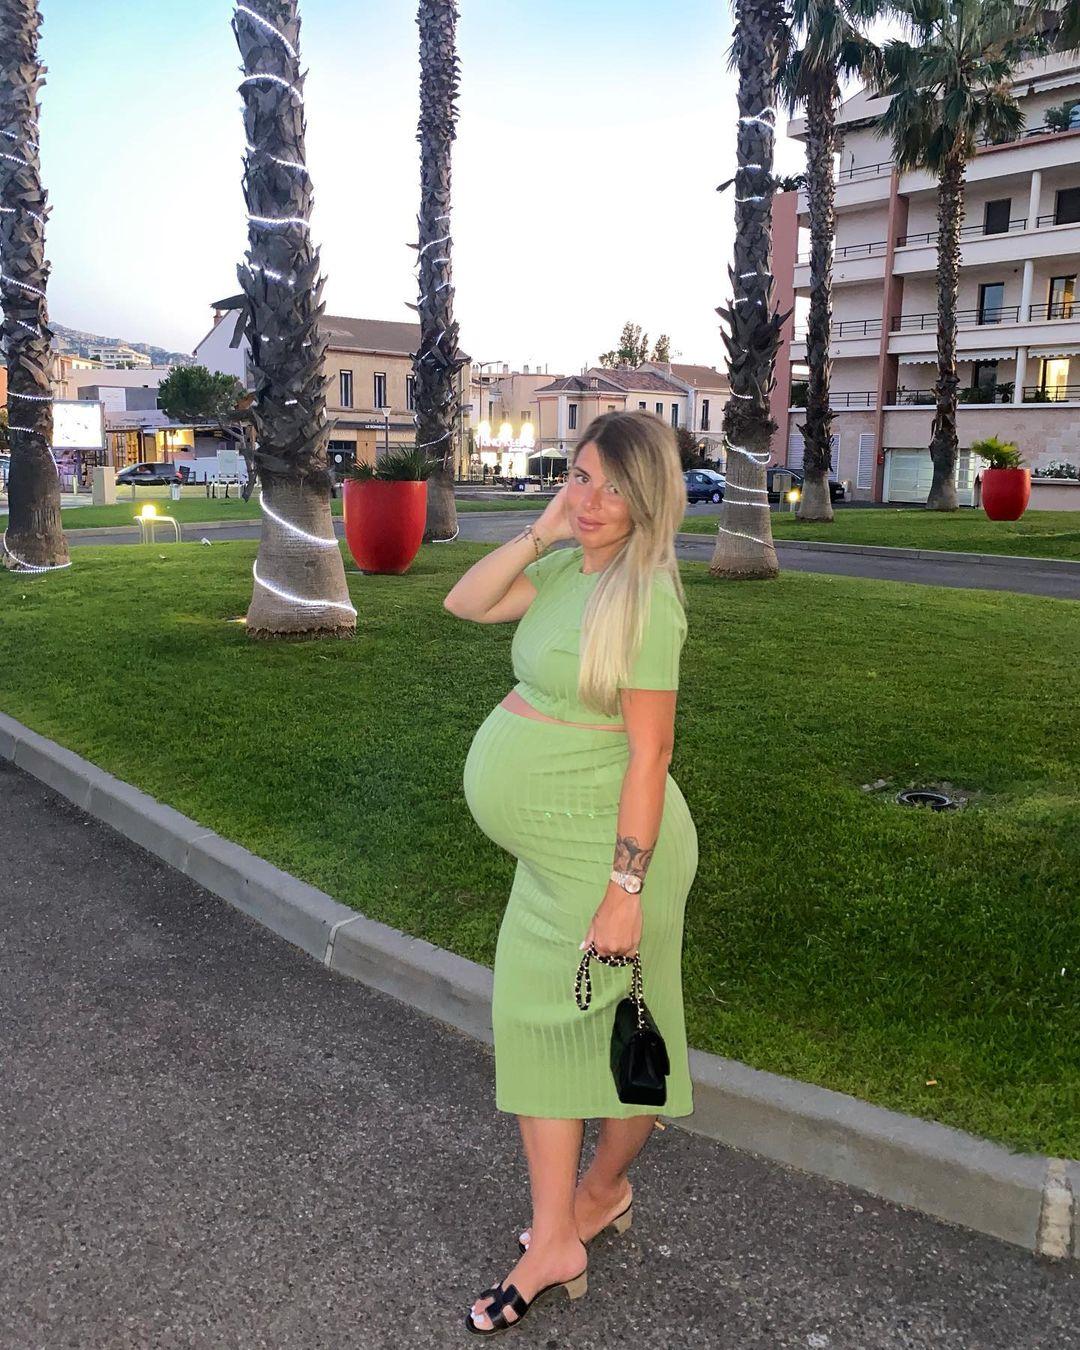 Model Emy Fiorelli Very Close to 1 Million Followers 1